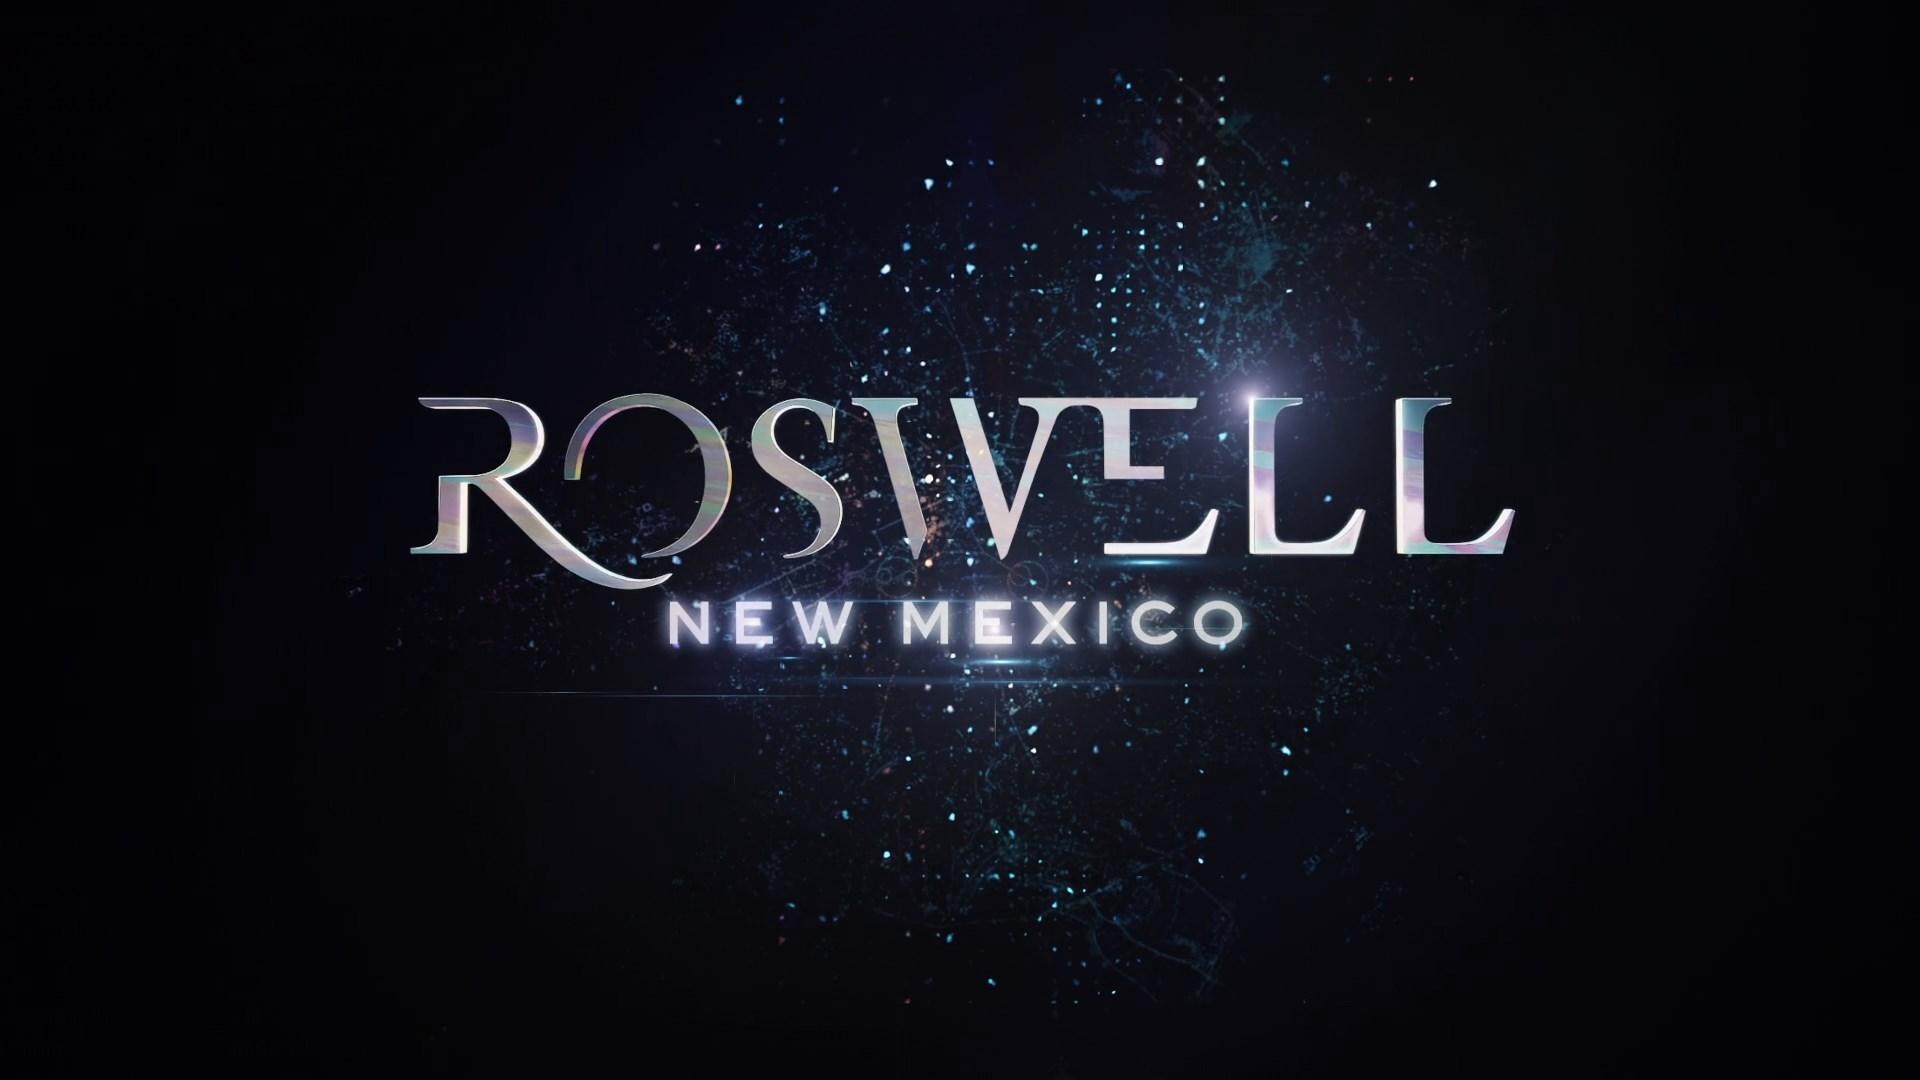 Roswell Nuevo Mexico Temporada 3 (2021) 1080p WEB-DL Latino